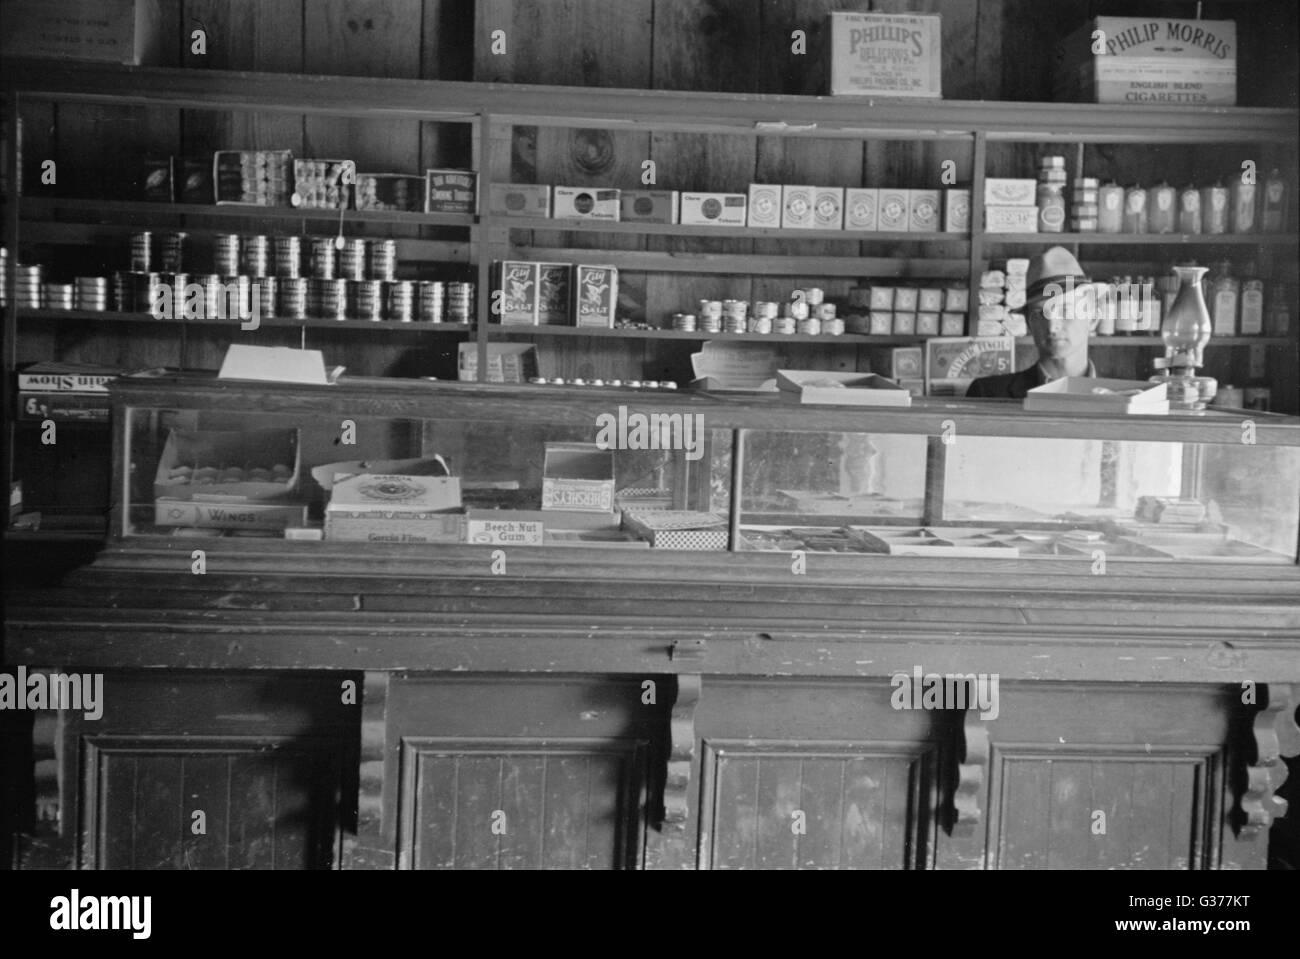 Store, Crabtree Creek Recreational Project, near Raleigh, North Carolina. Date 1936 Mar. - Stock Image